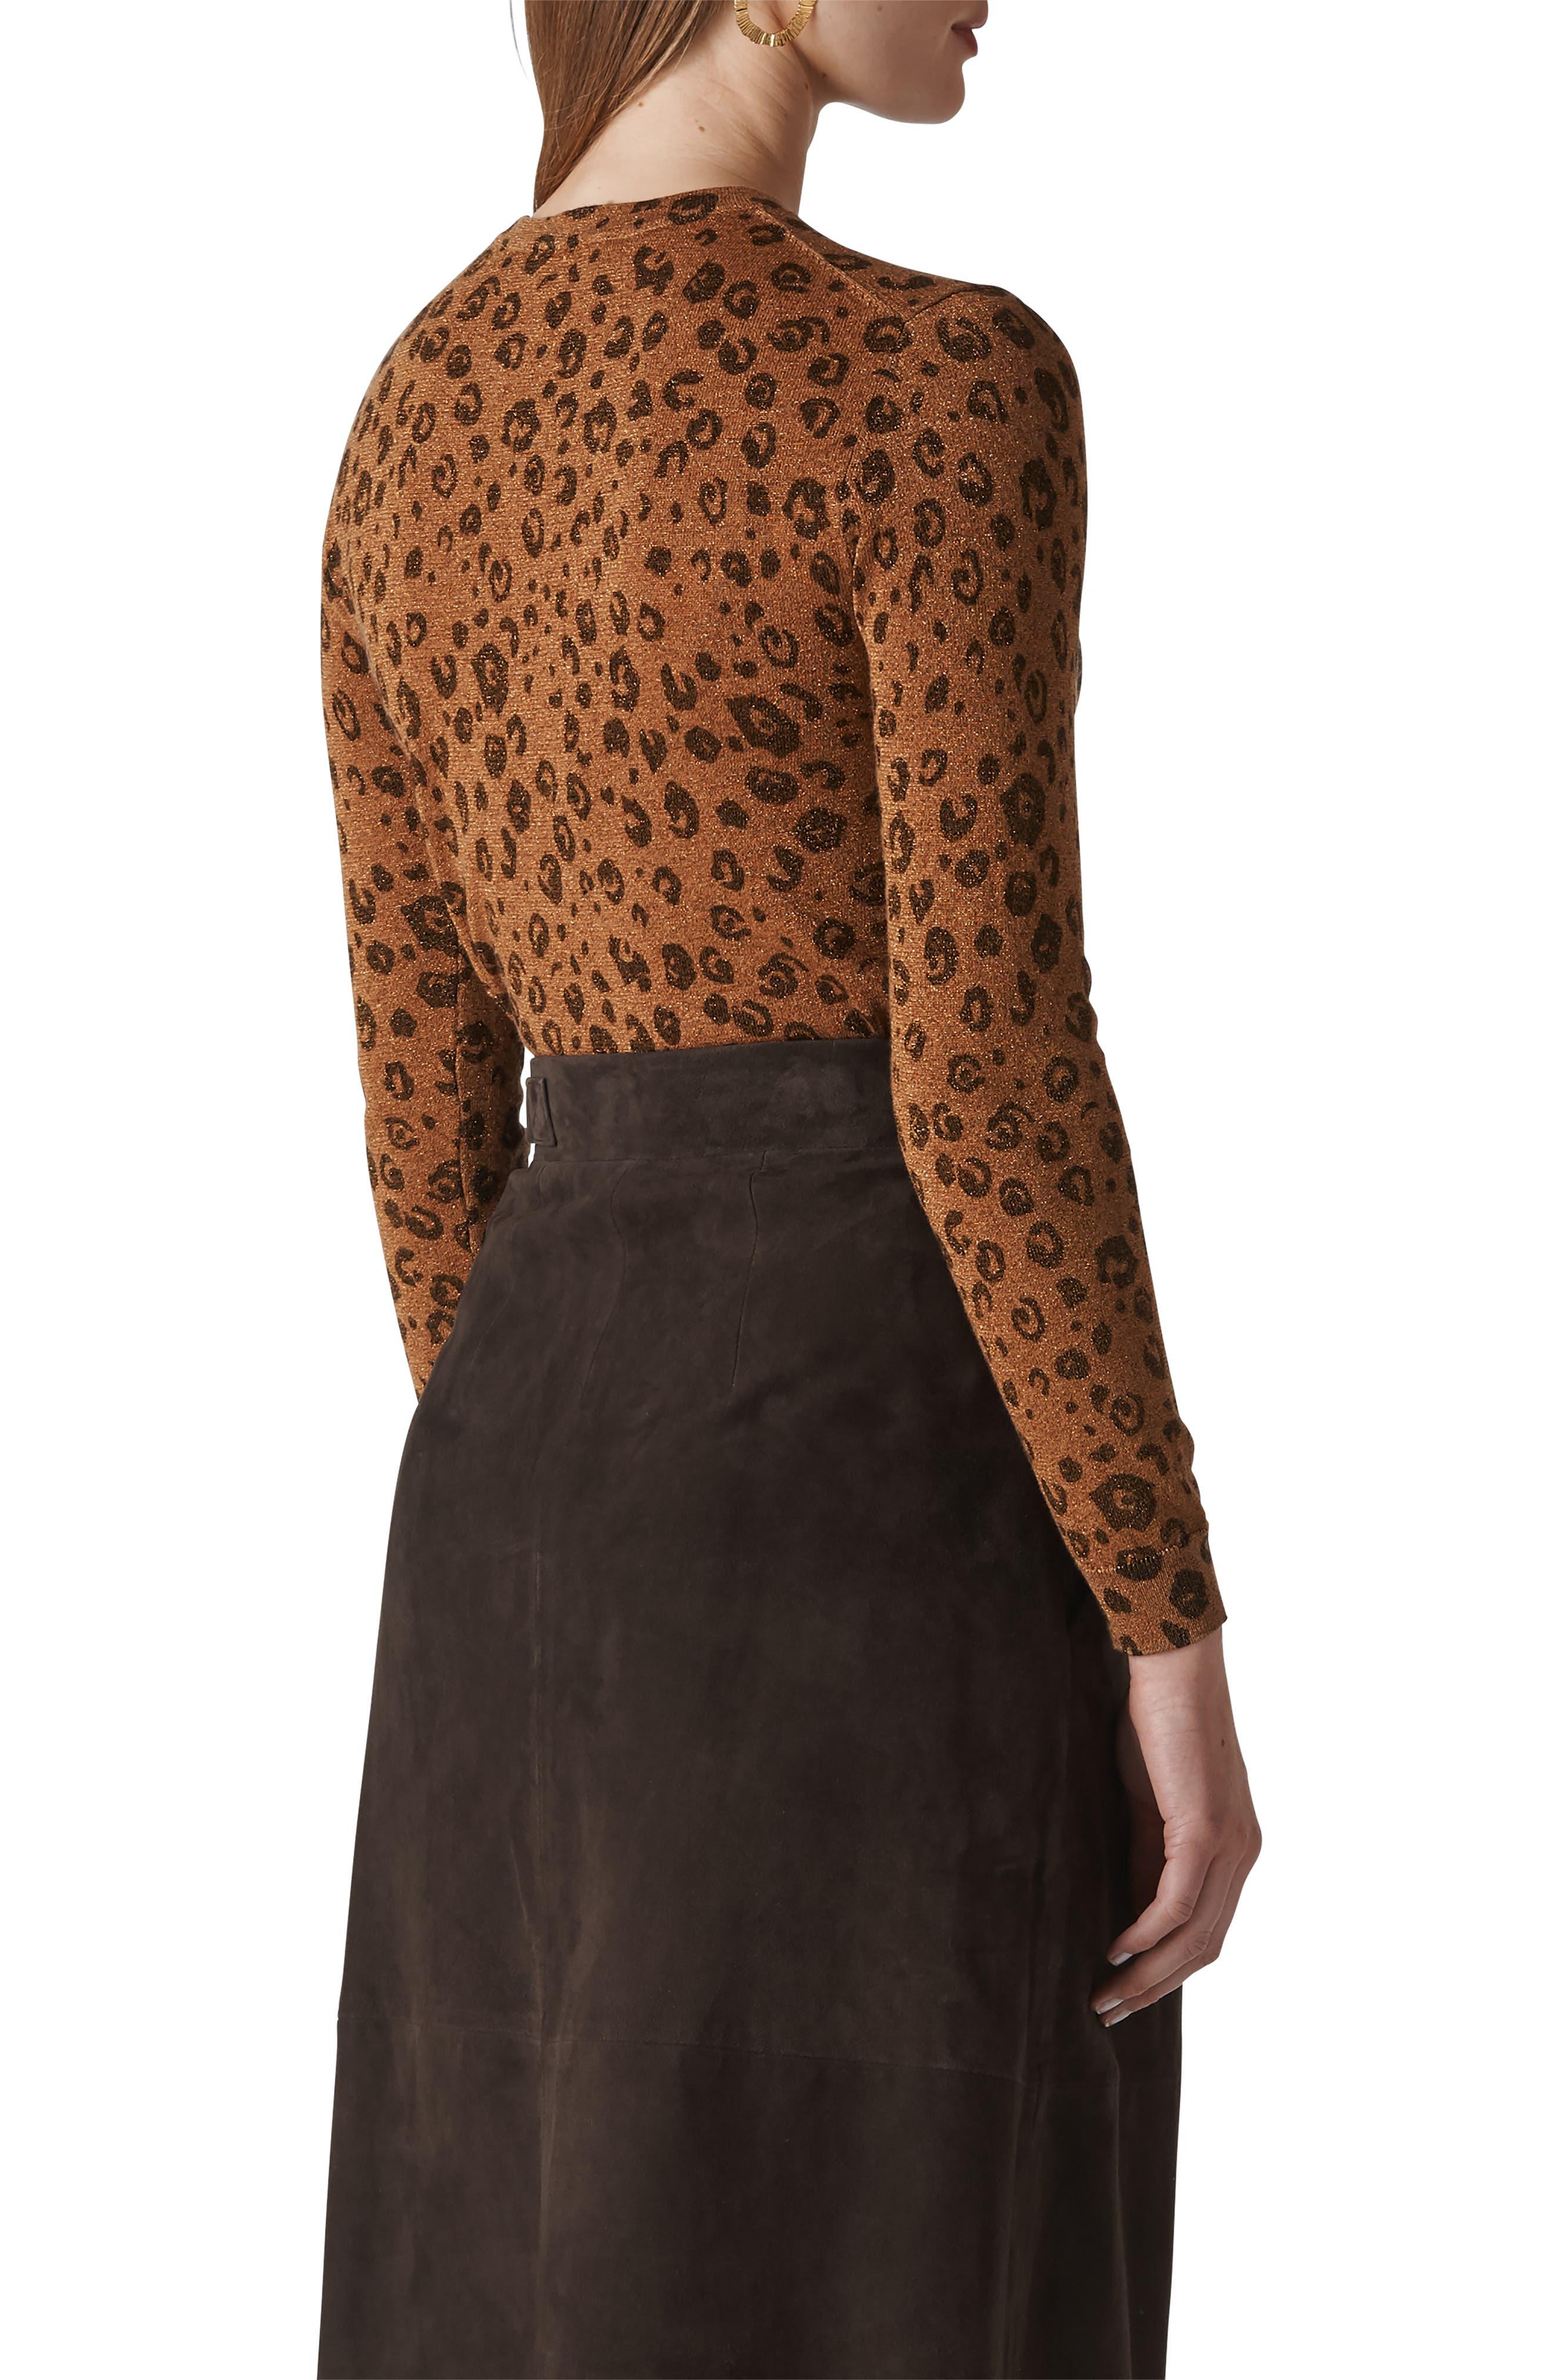 Cheetah Sparkle Sweater,                             Alternate thumbnail 2, color,                             MULTICOLOUR